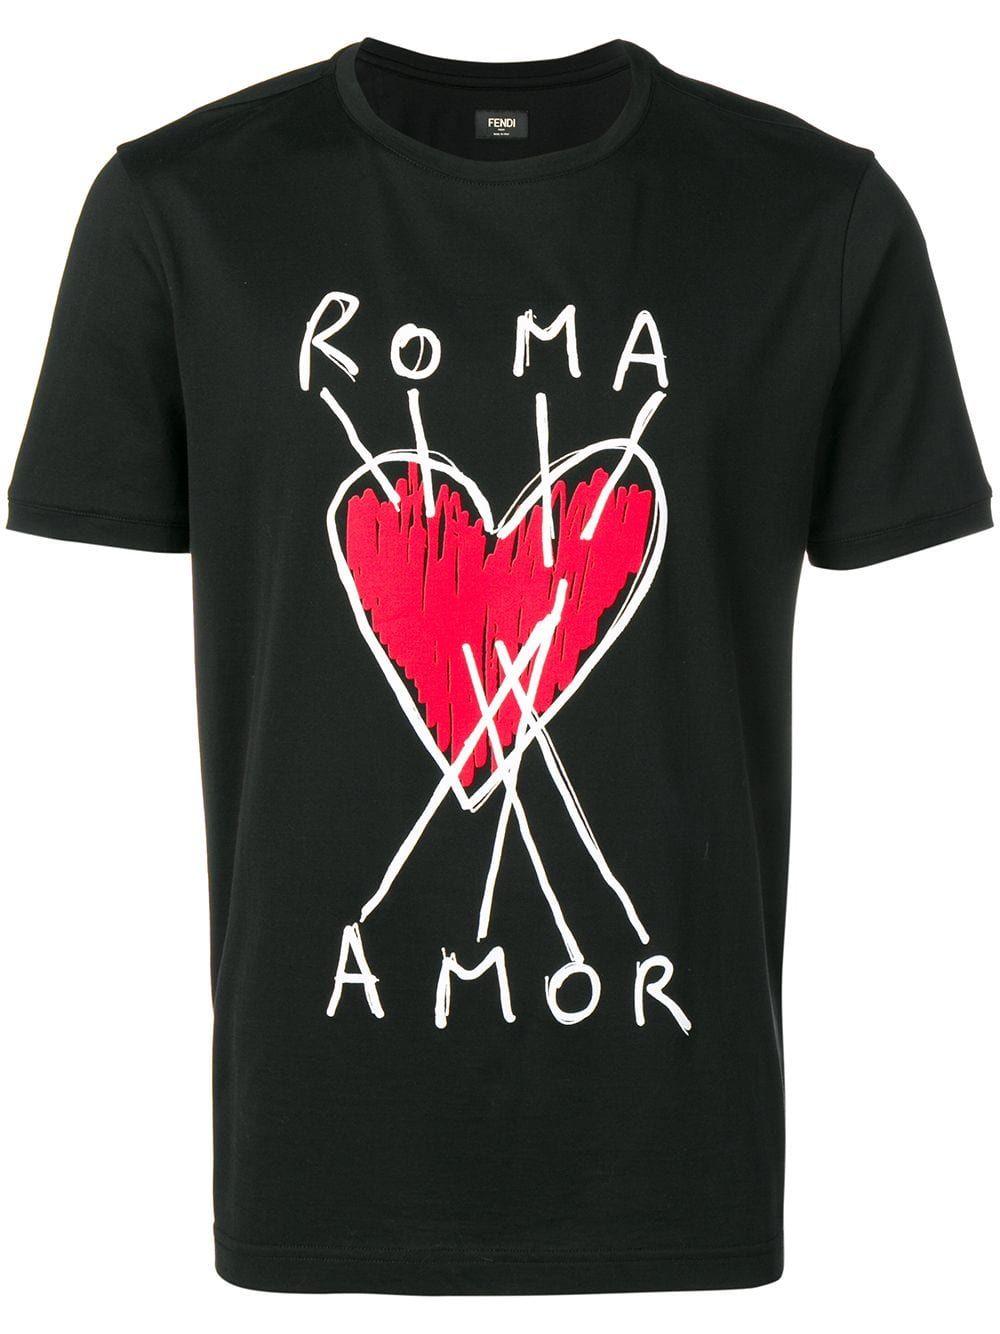 f3fe1b5a FENDI FENDI ROMA AMOR T-SHIRT - BLACK. #fendi #cloth | Fendi in 2019 ...